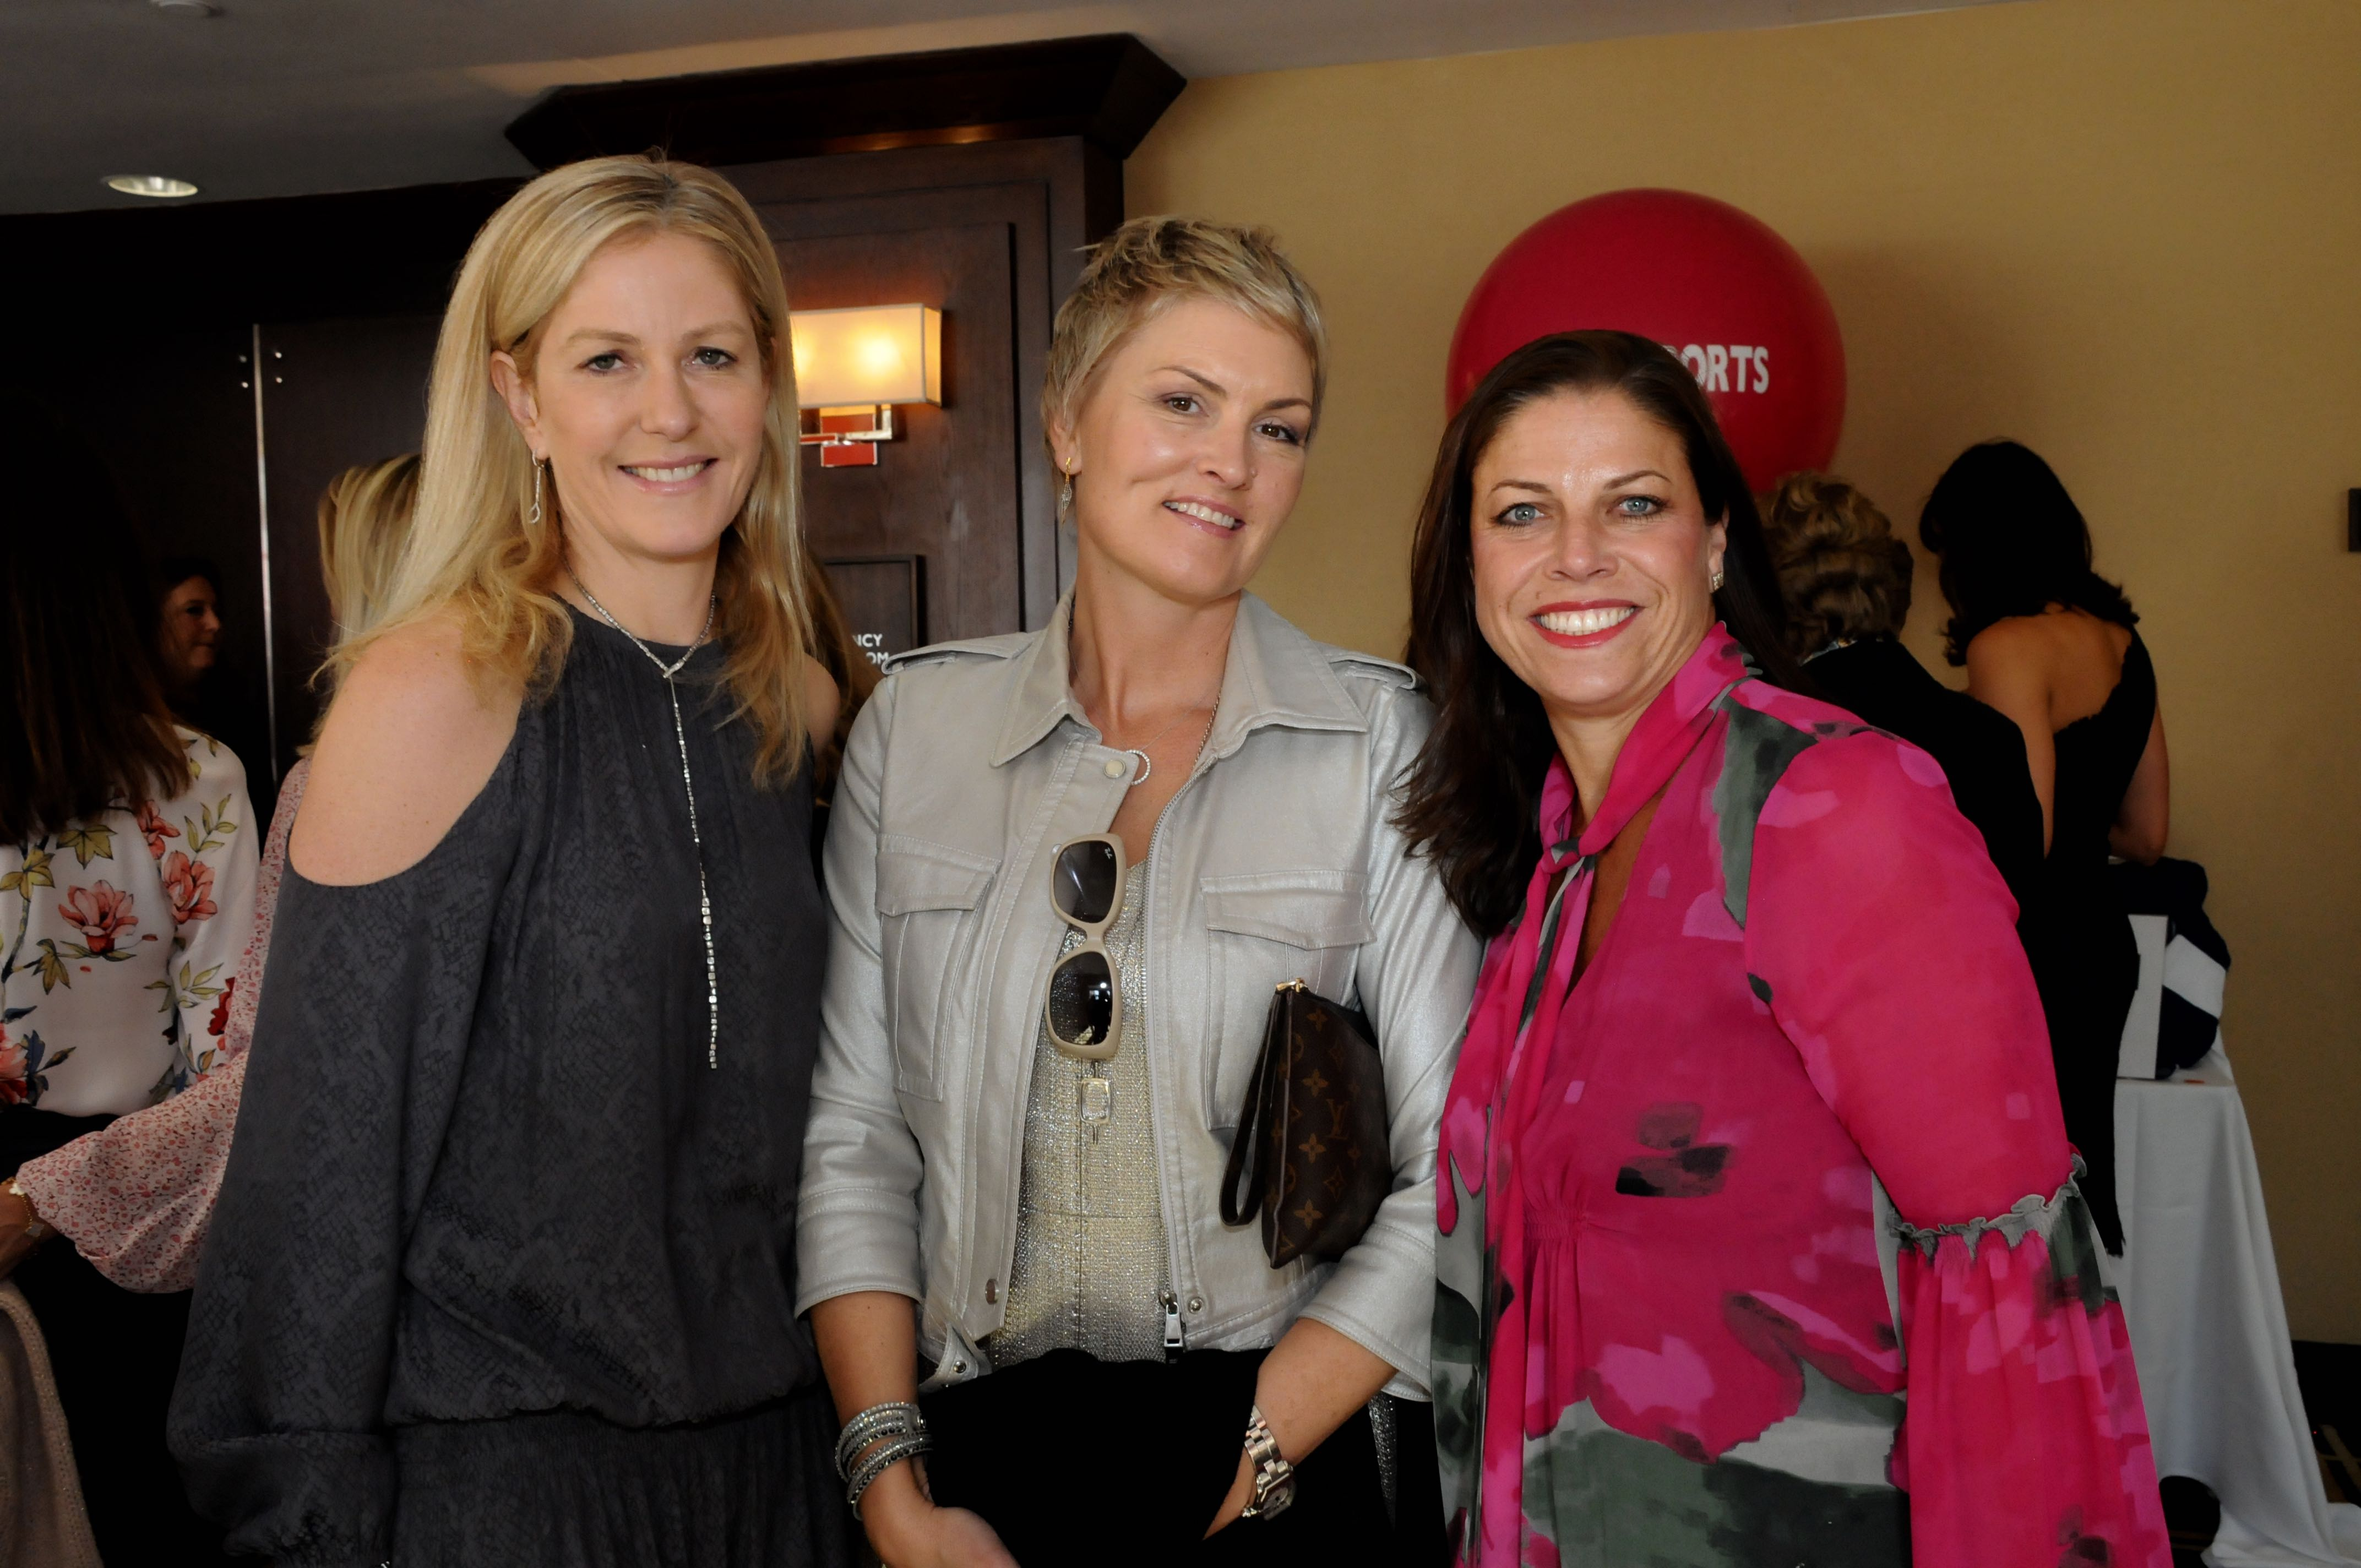 Nattalie Weigenfeld, Eileen Collins, Alessandra Messineo Long